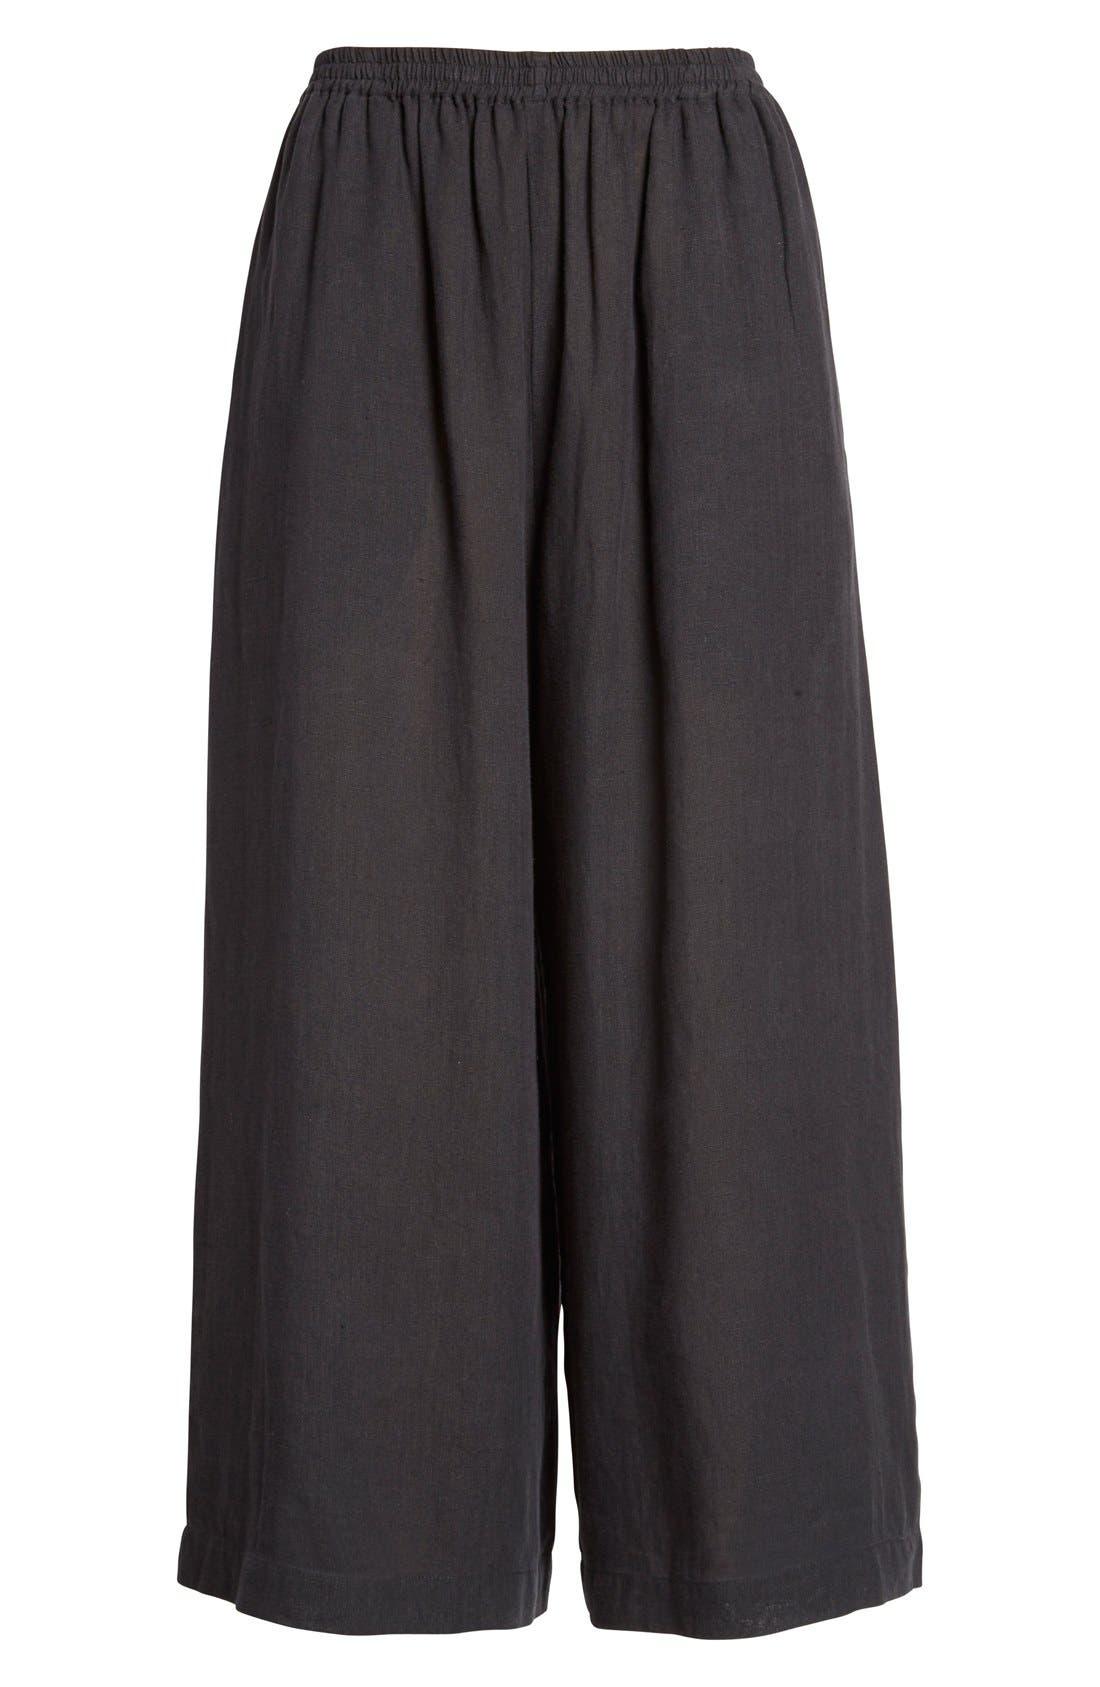 Alternate Image 4  - eskandarHandkerchief Linen Flare Crop Pants